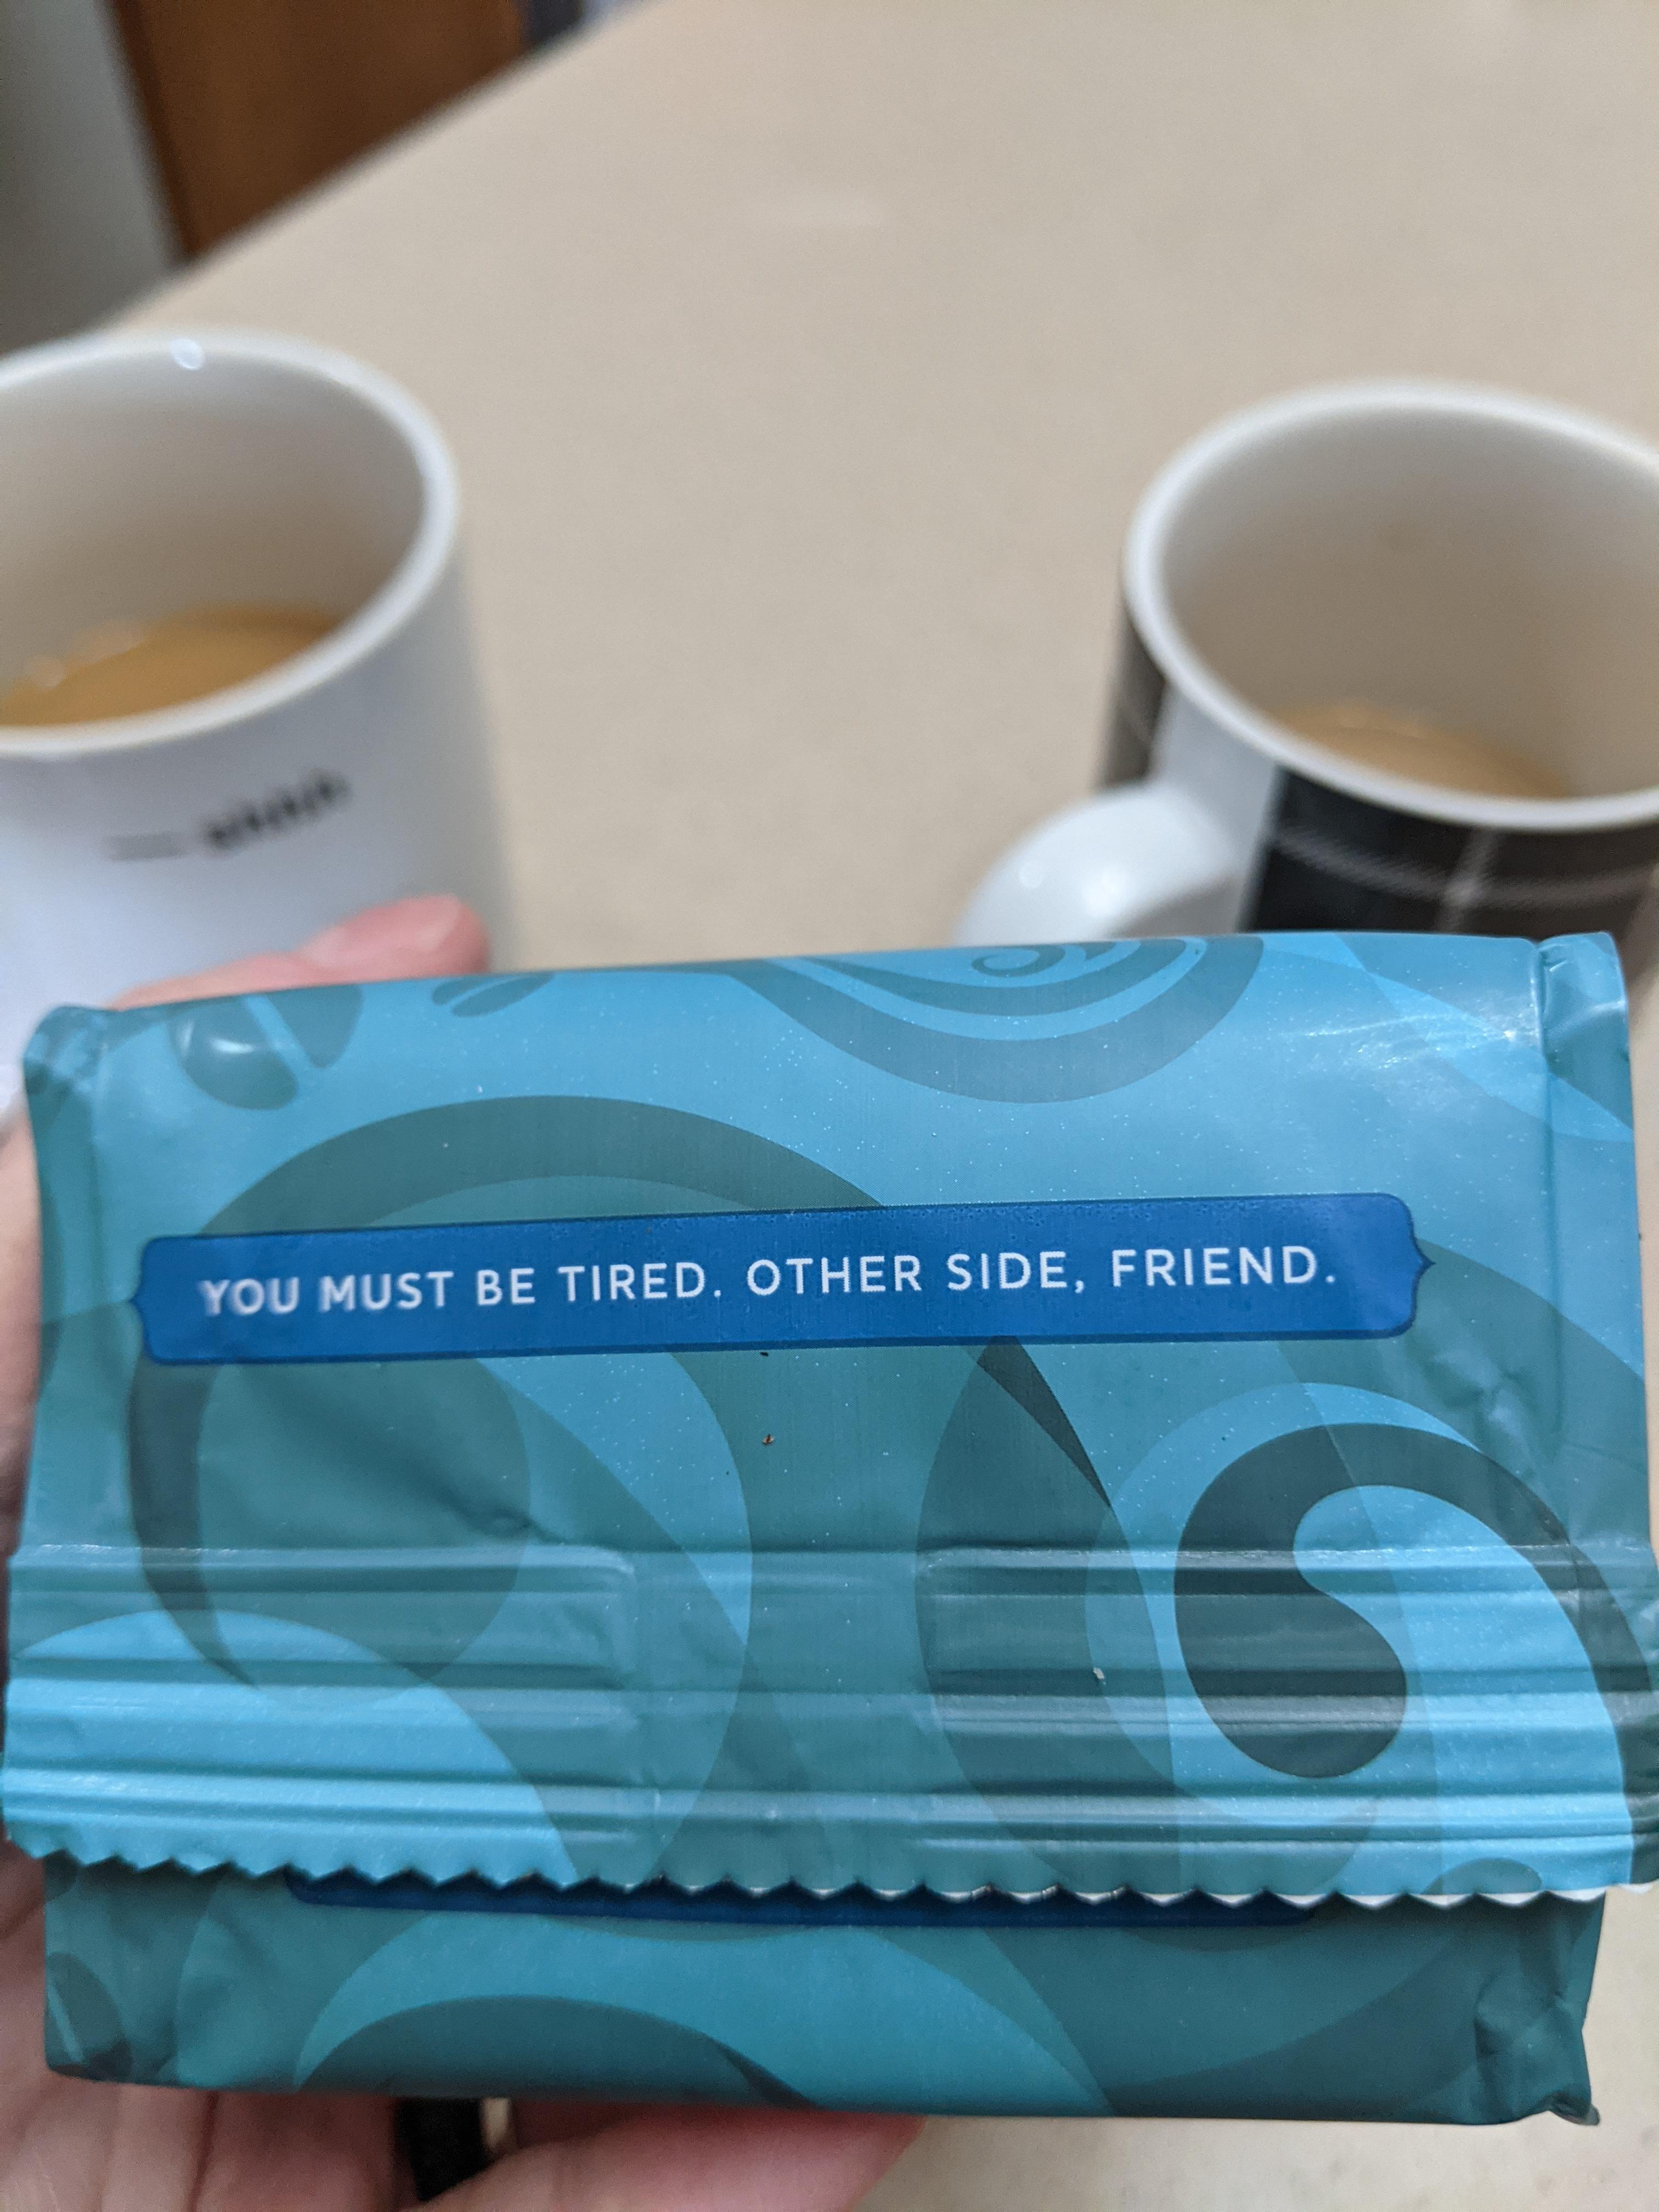 On the bottom of my coffee bag